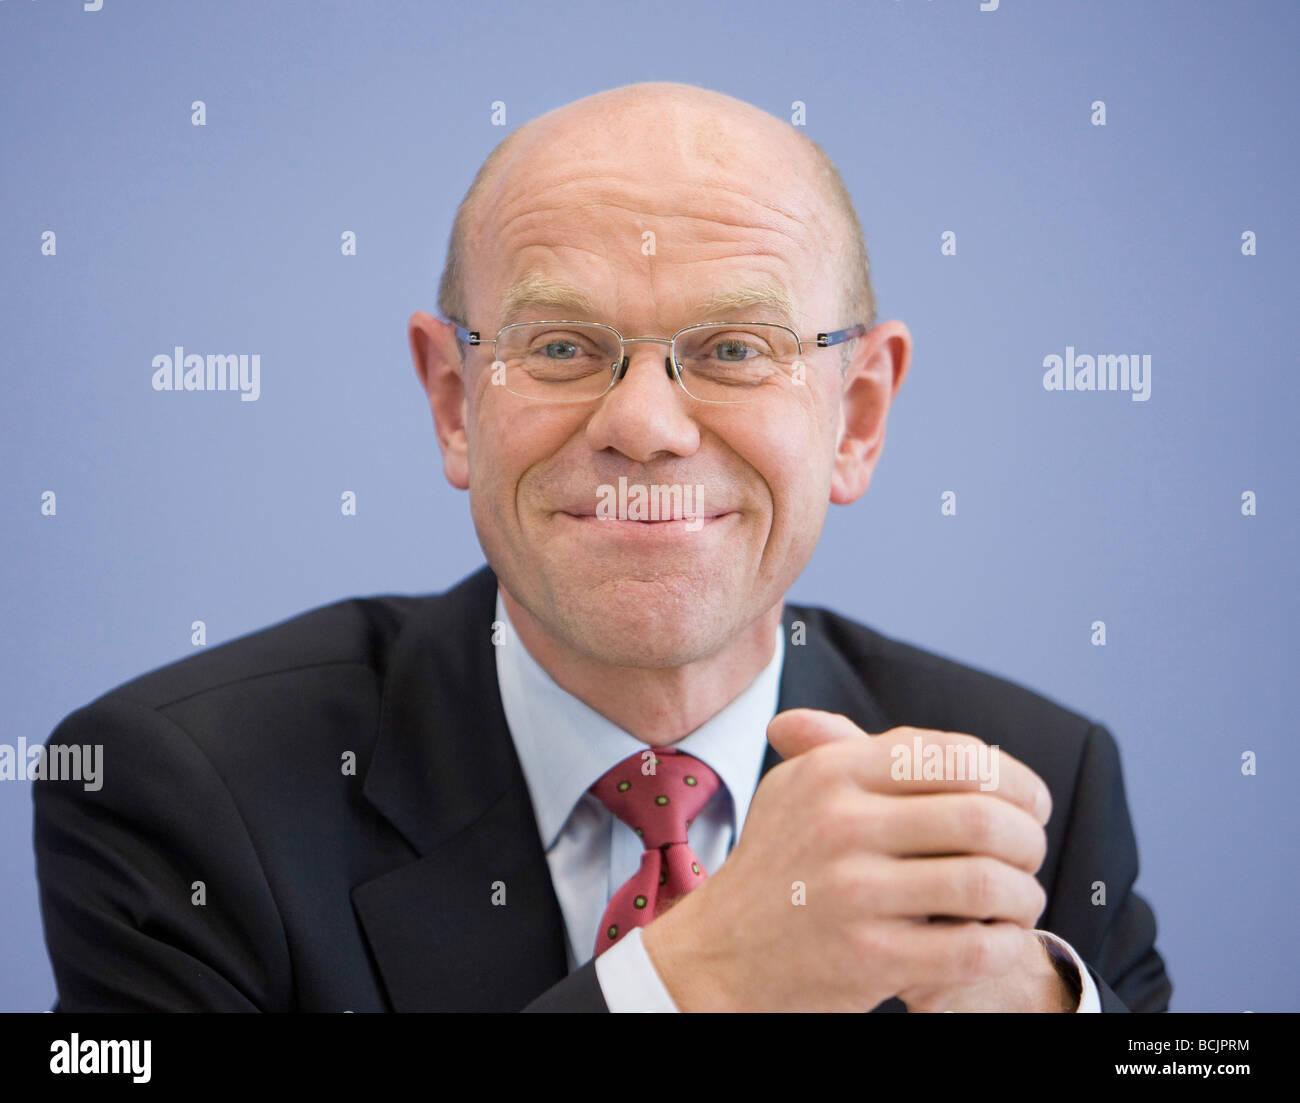 Thoams STEG deputy government spokesman - Stock Image